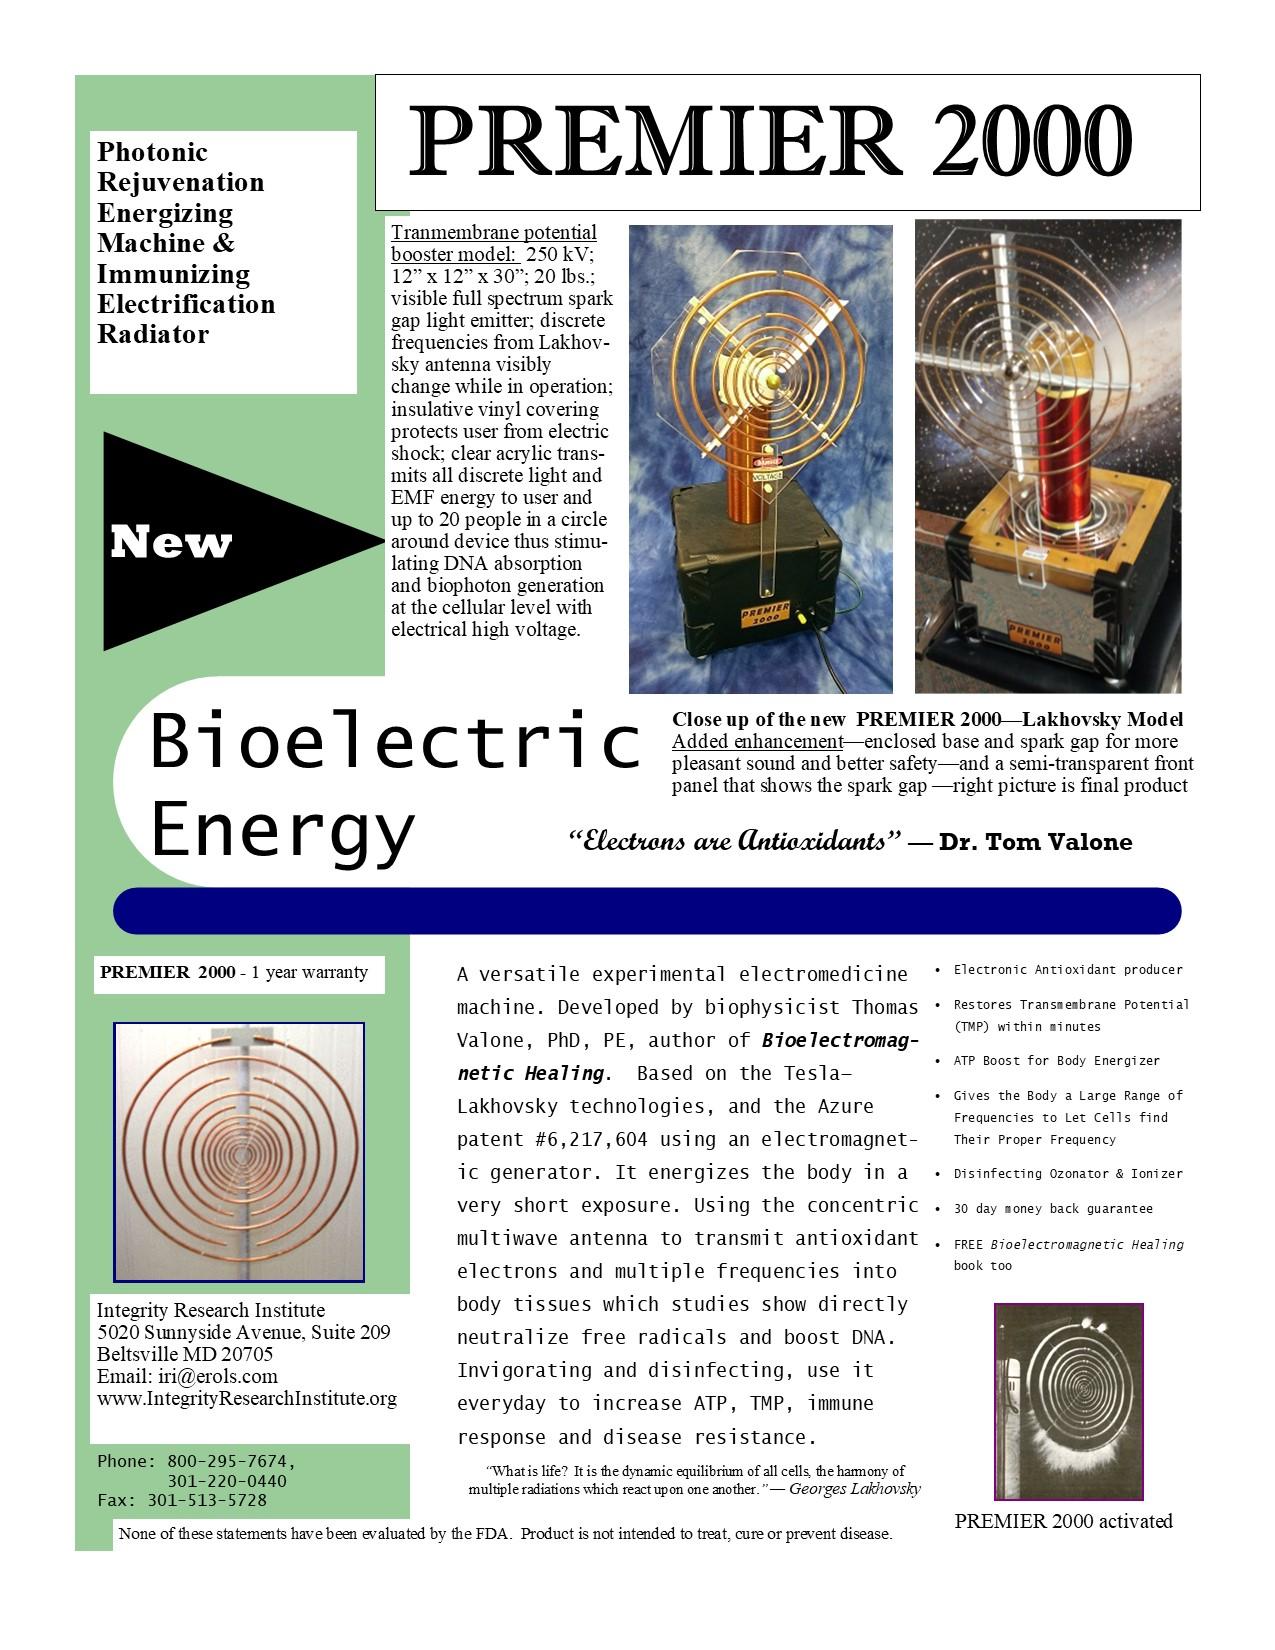 BioEnergyDevice org - IRI Catalog Pages